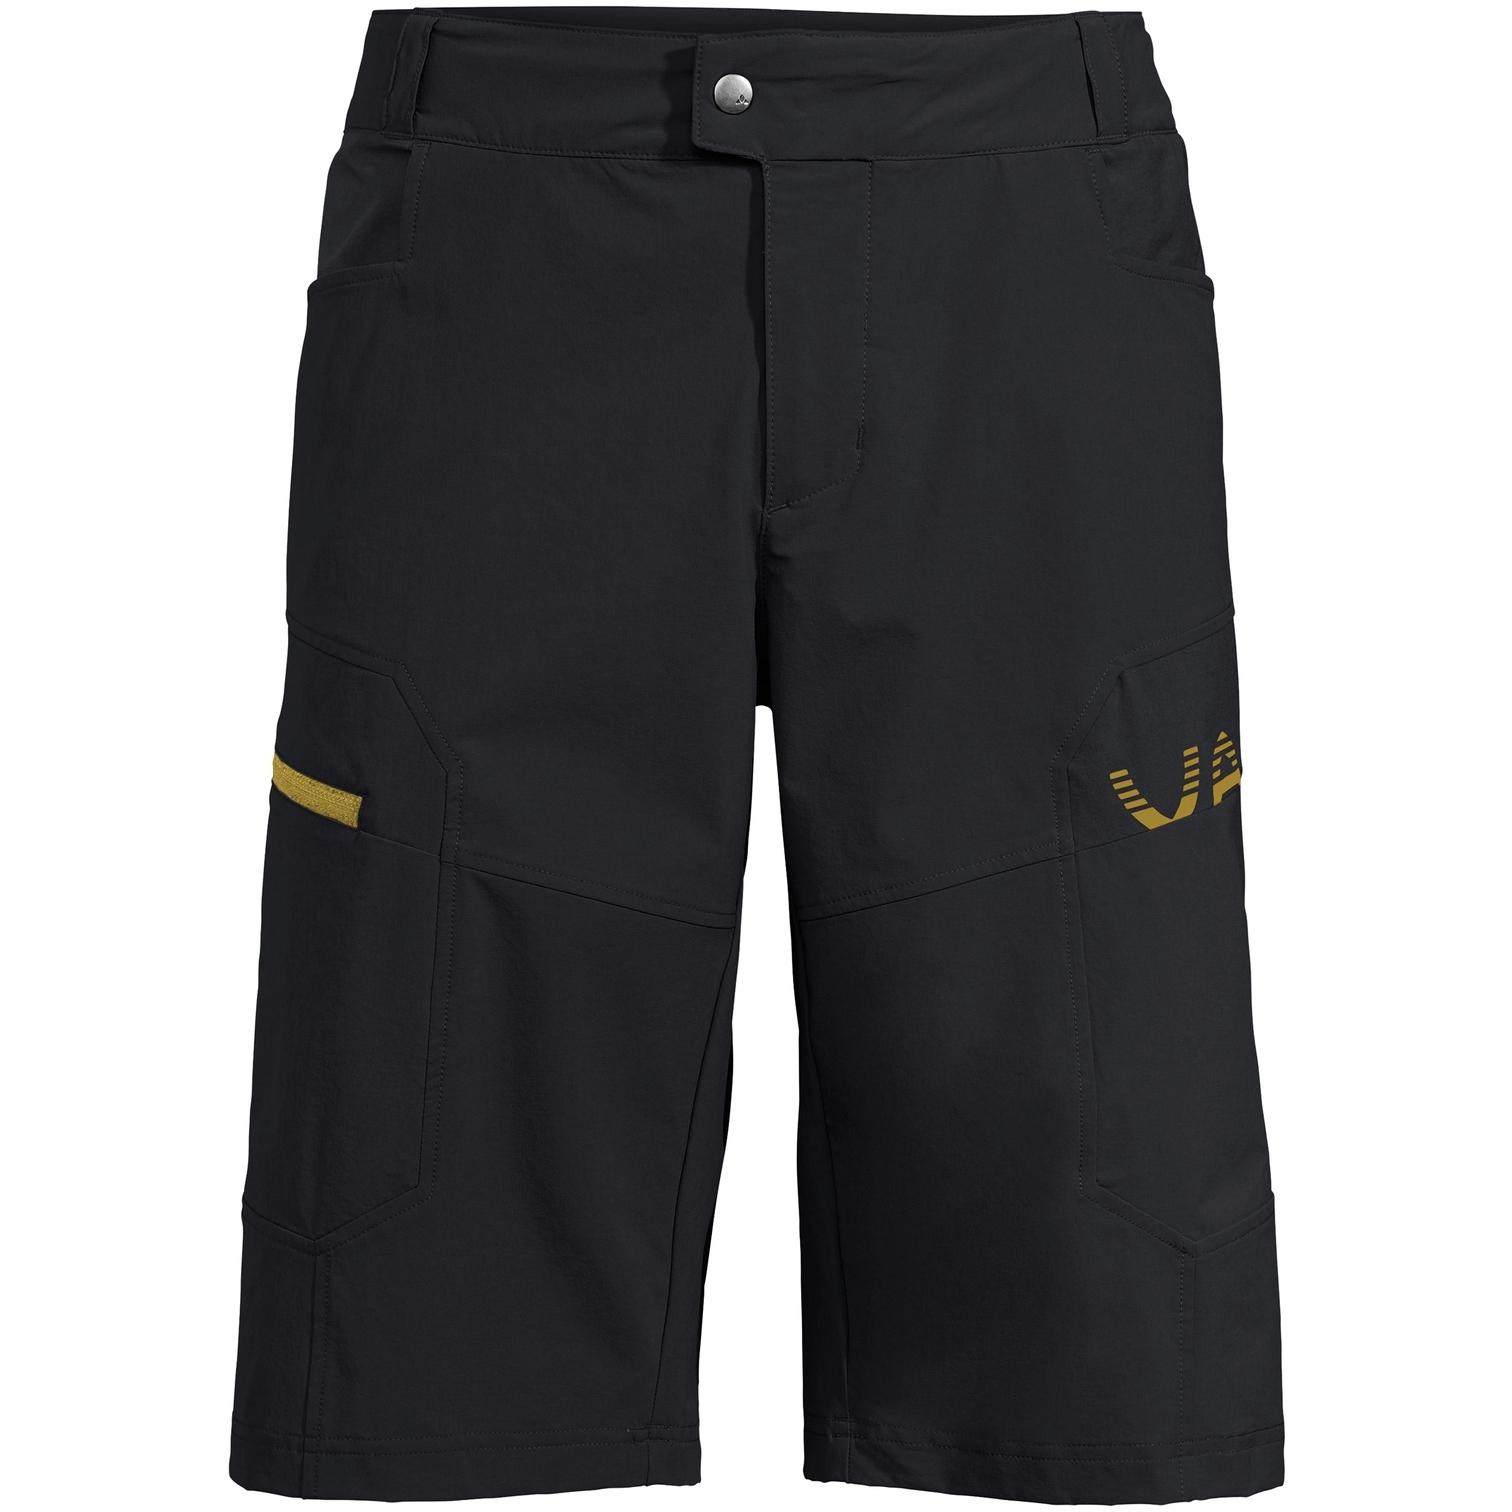 Vaude Altissimo Shorts III - schwarz/schwarz